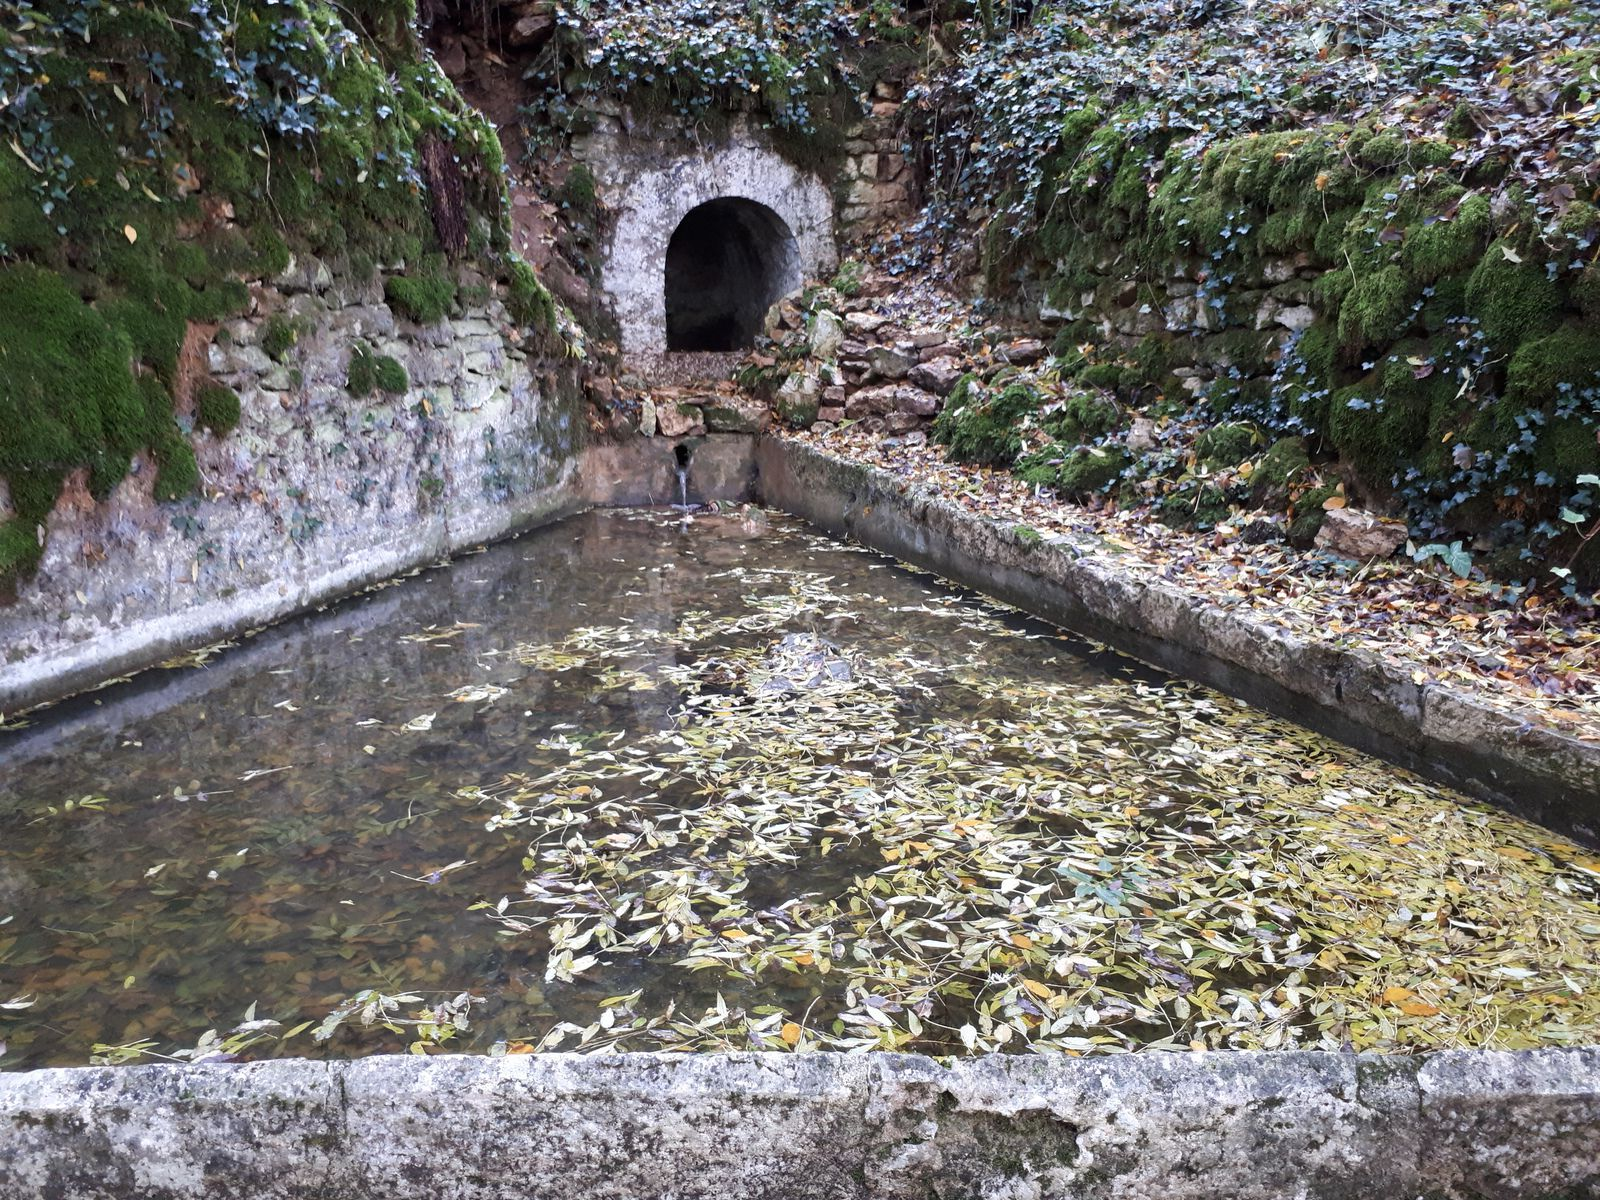 Fontaine de Branty restaurée en 2002